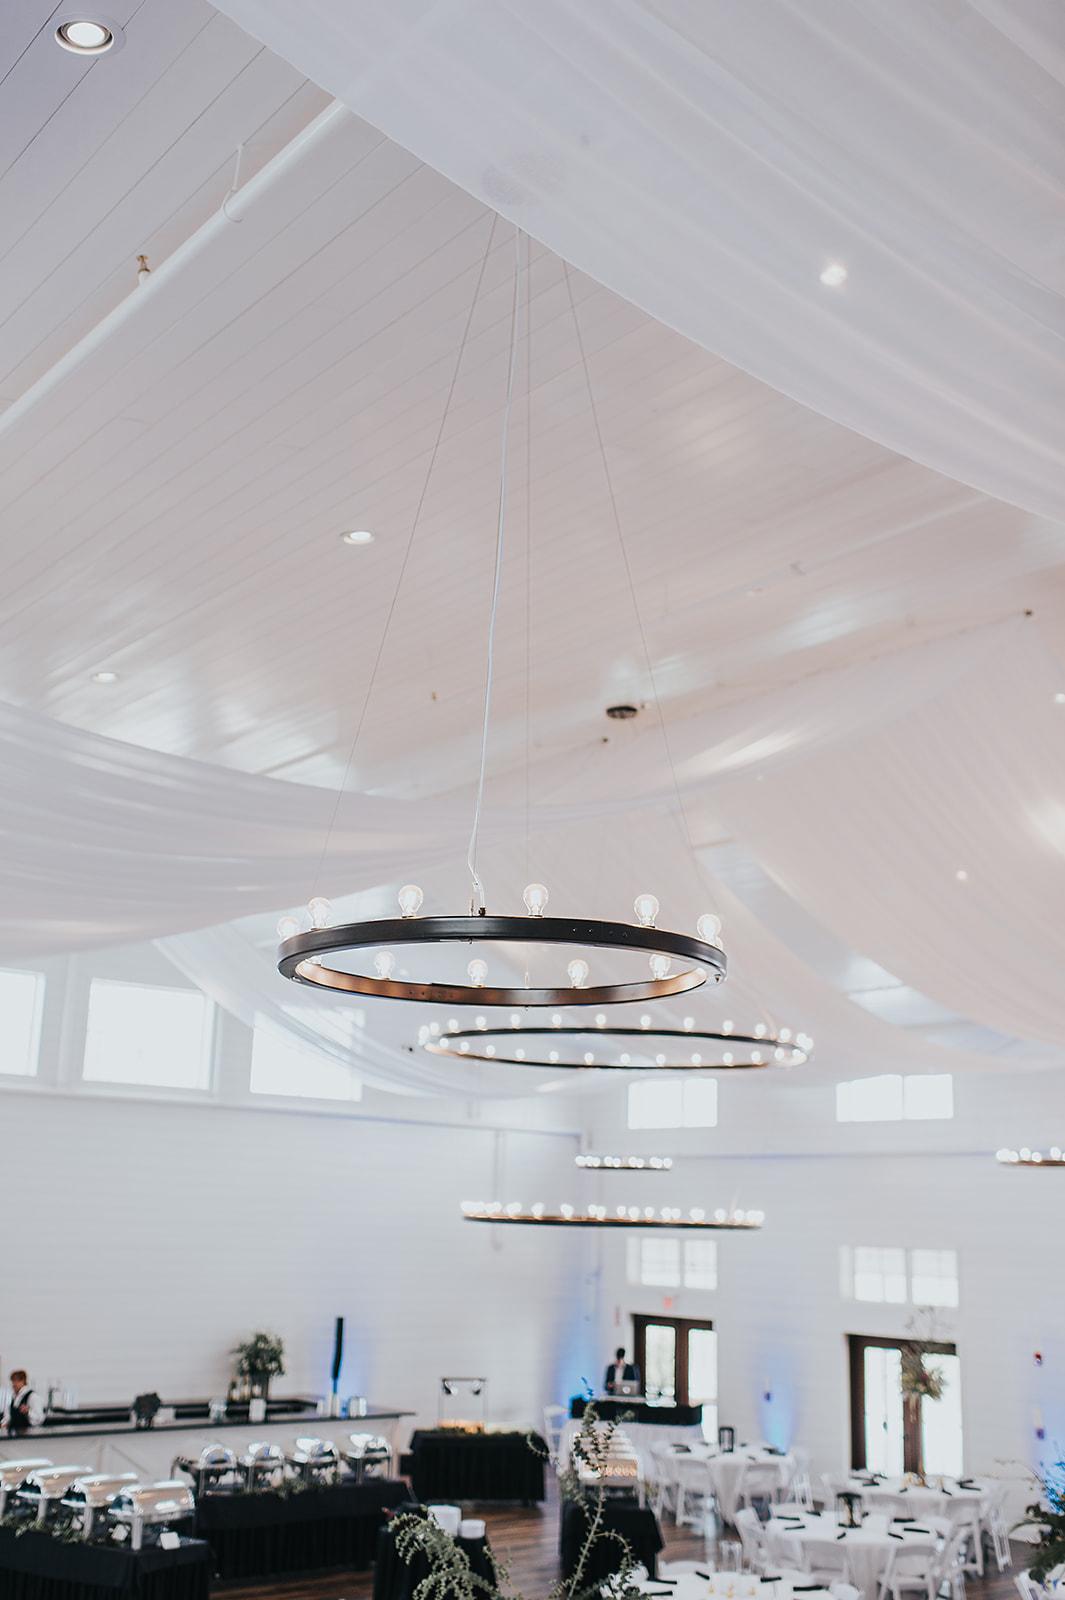 Ballroom - Ceiling & Chandeliers